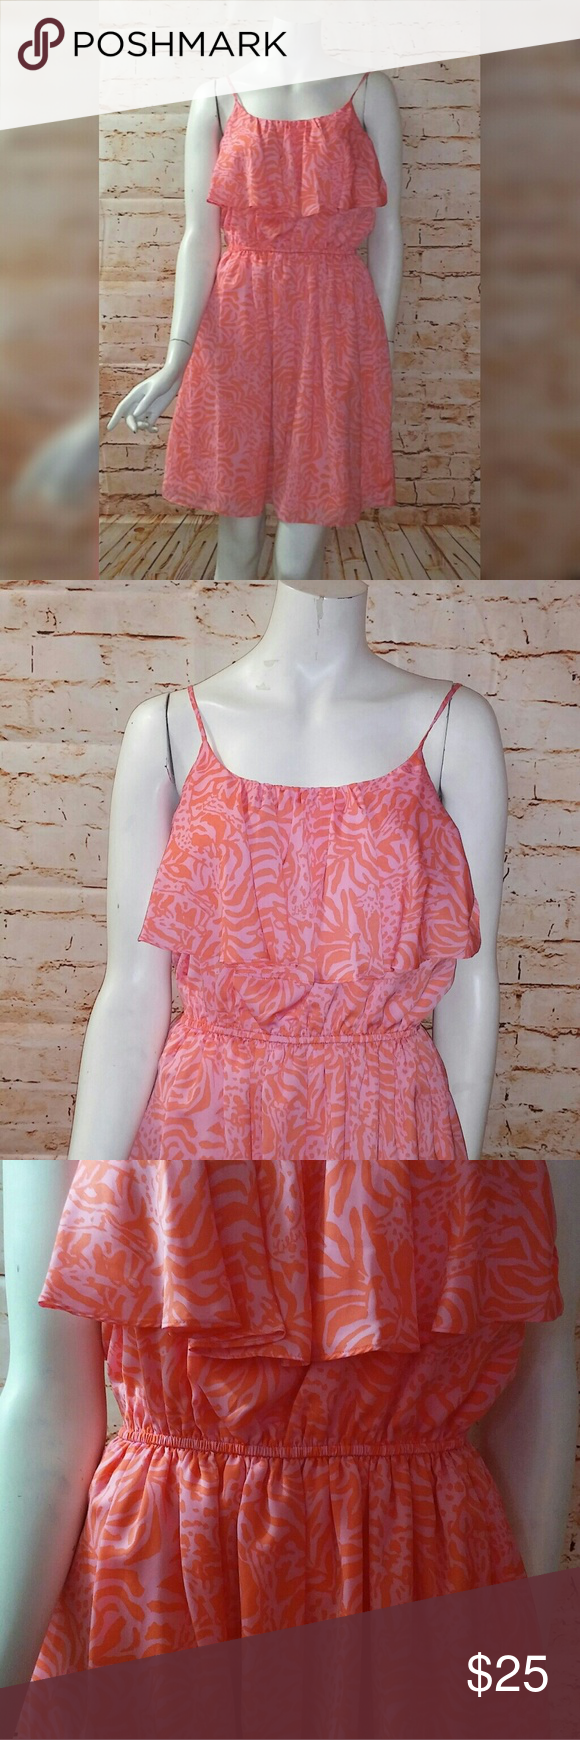 Lilly Pulitzer For Target M Pink Orange Dress Orange Dress Lilly Pulitzer Target Clothes Design [ 1740 x 580 Pixel ]